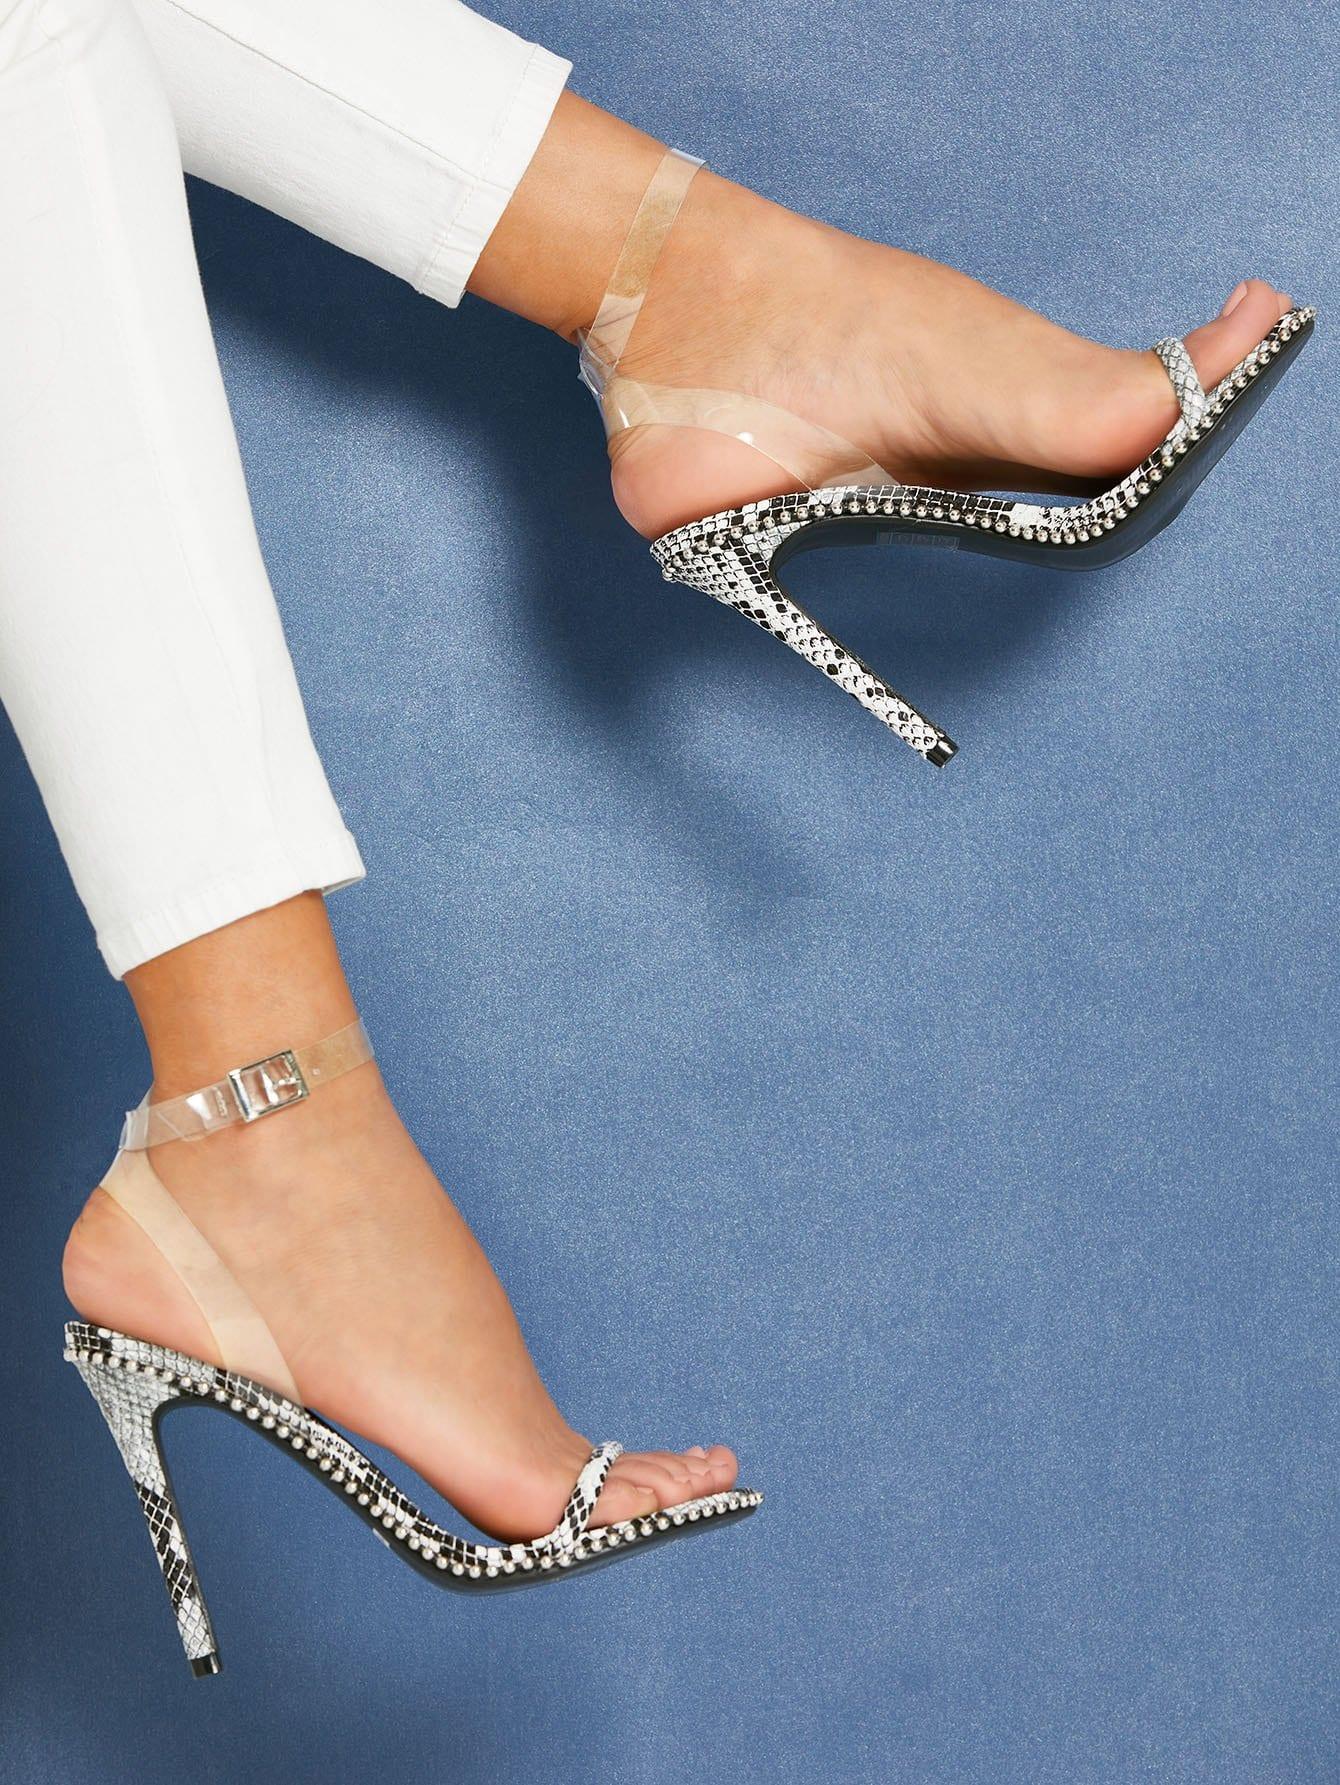 Ankle Strap Snakeskin Print Stiletto Heels stiletto metallic ankle strap heels